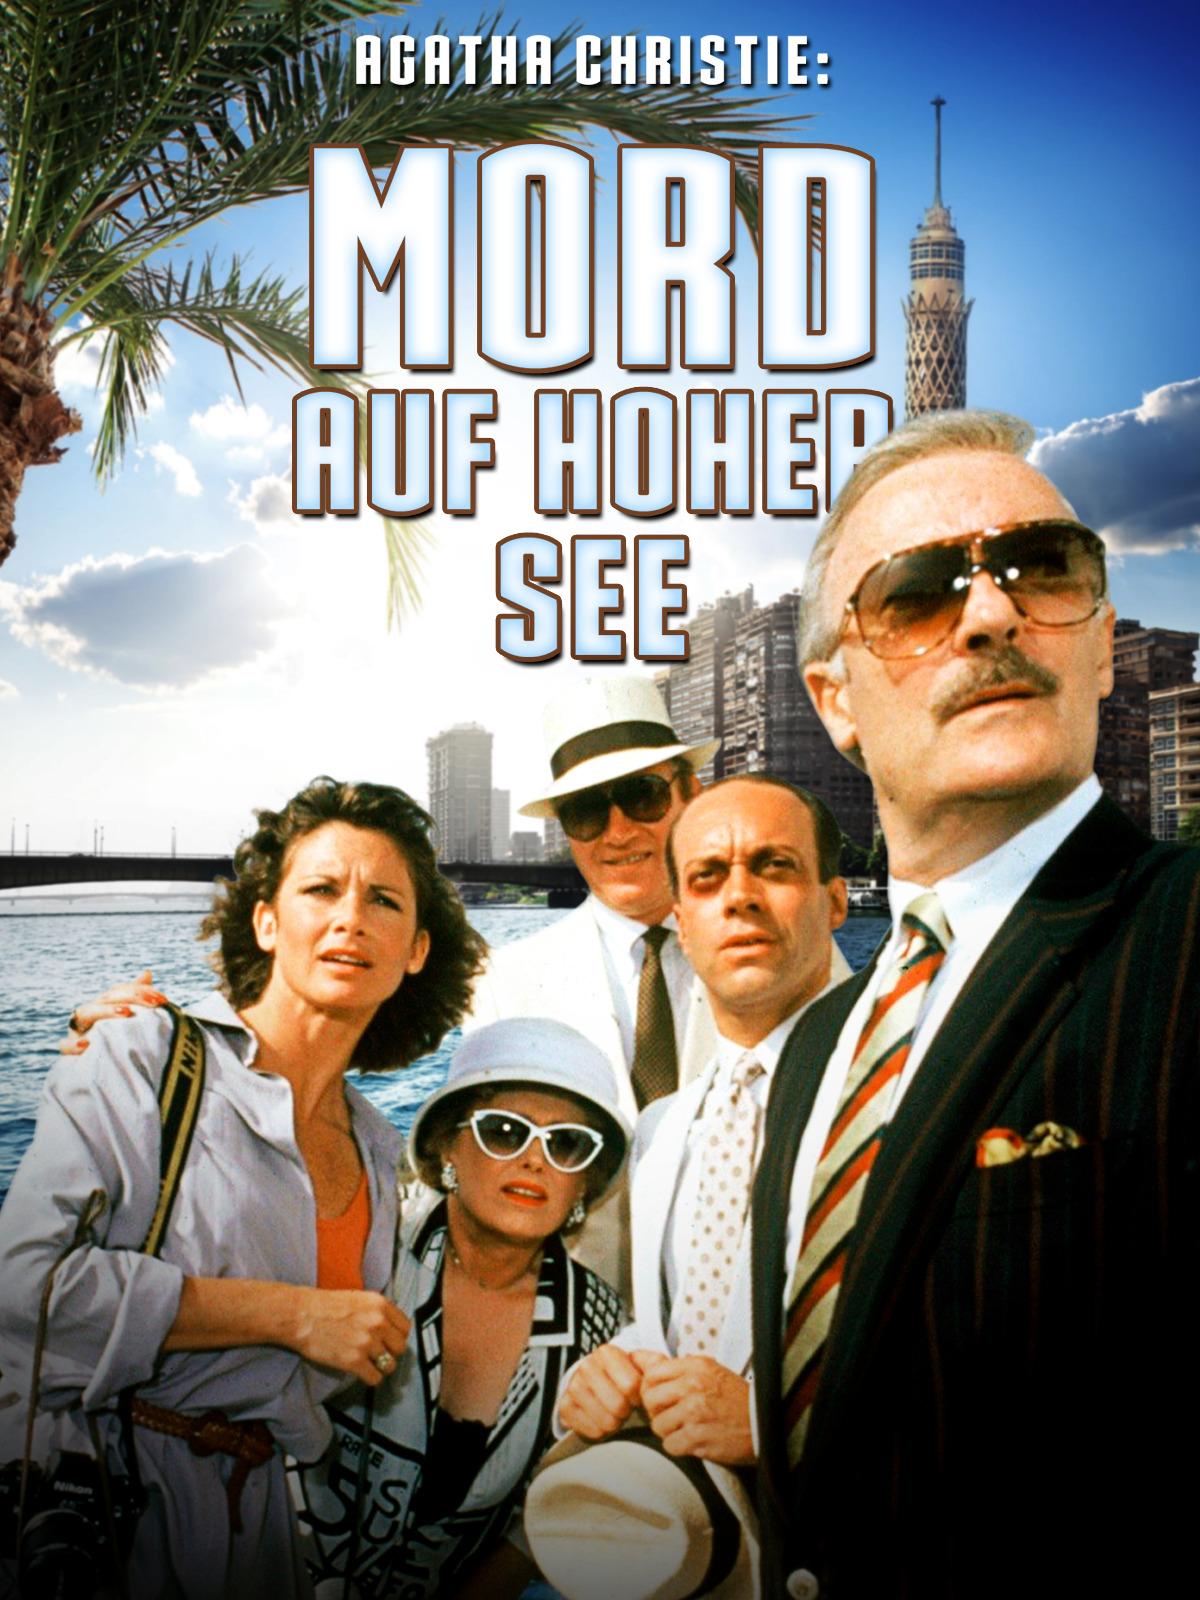 Agatha Christie: Mord auf hoher See